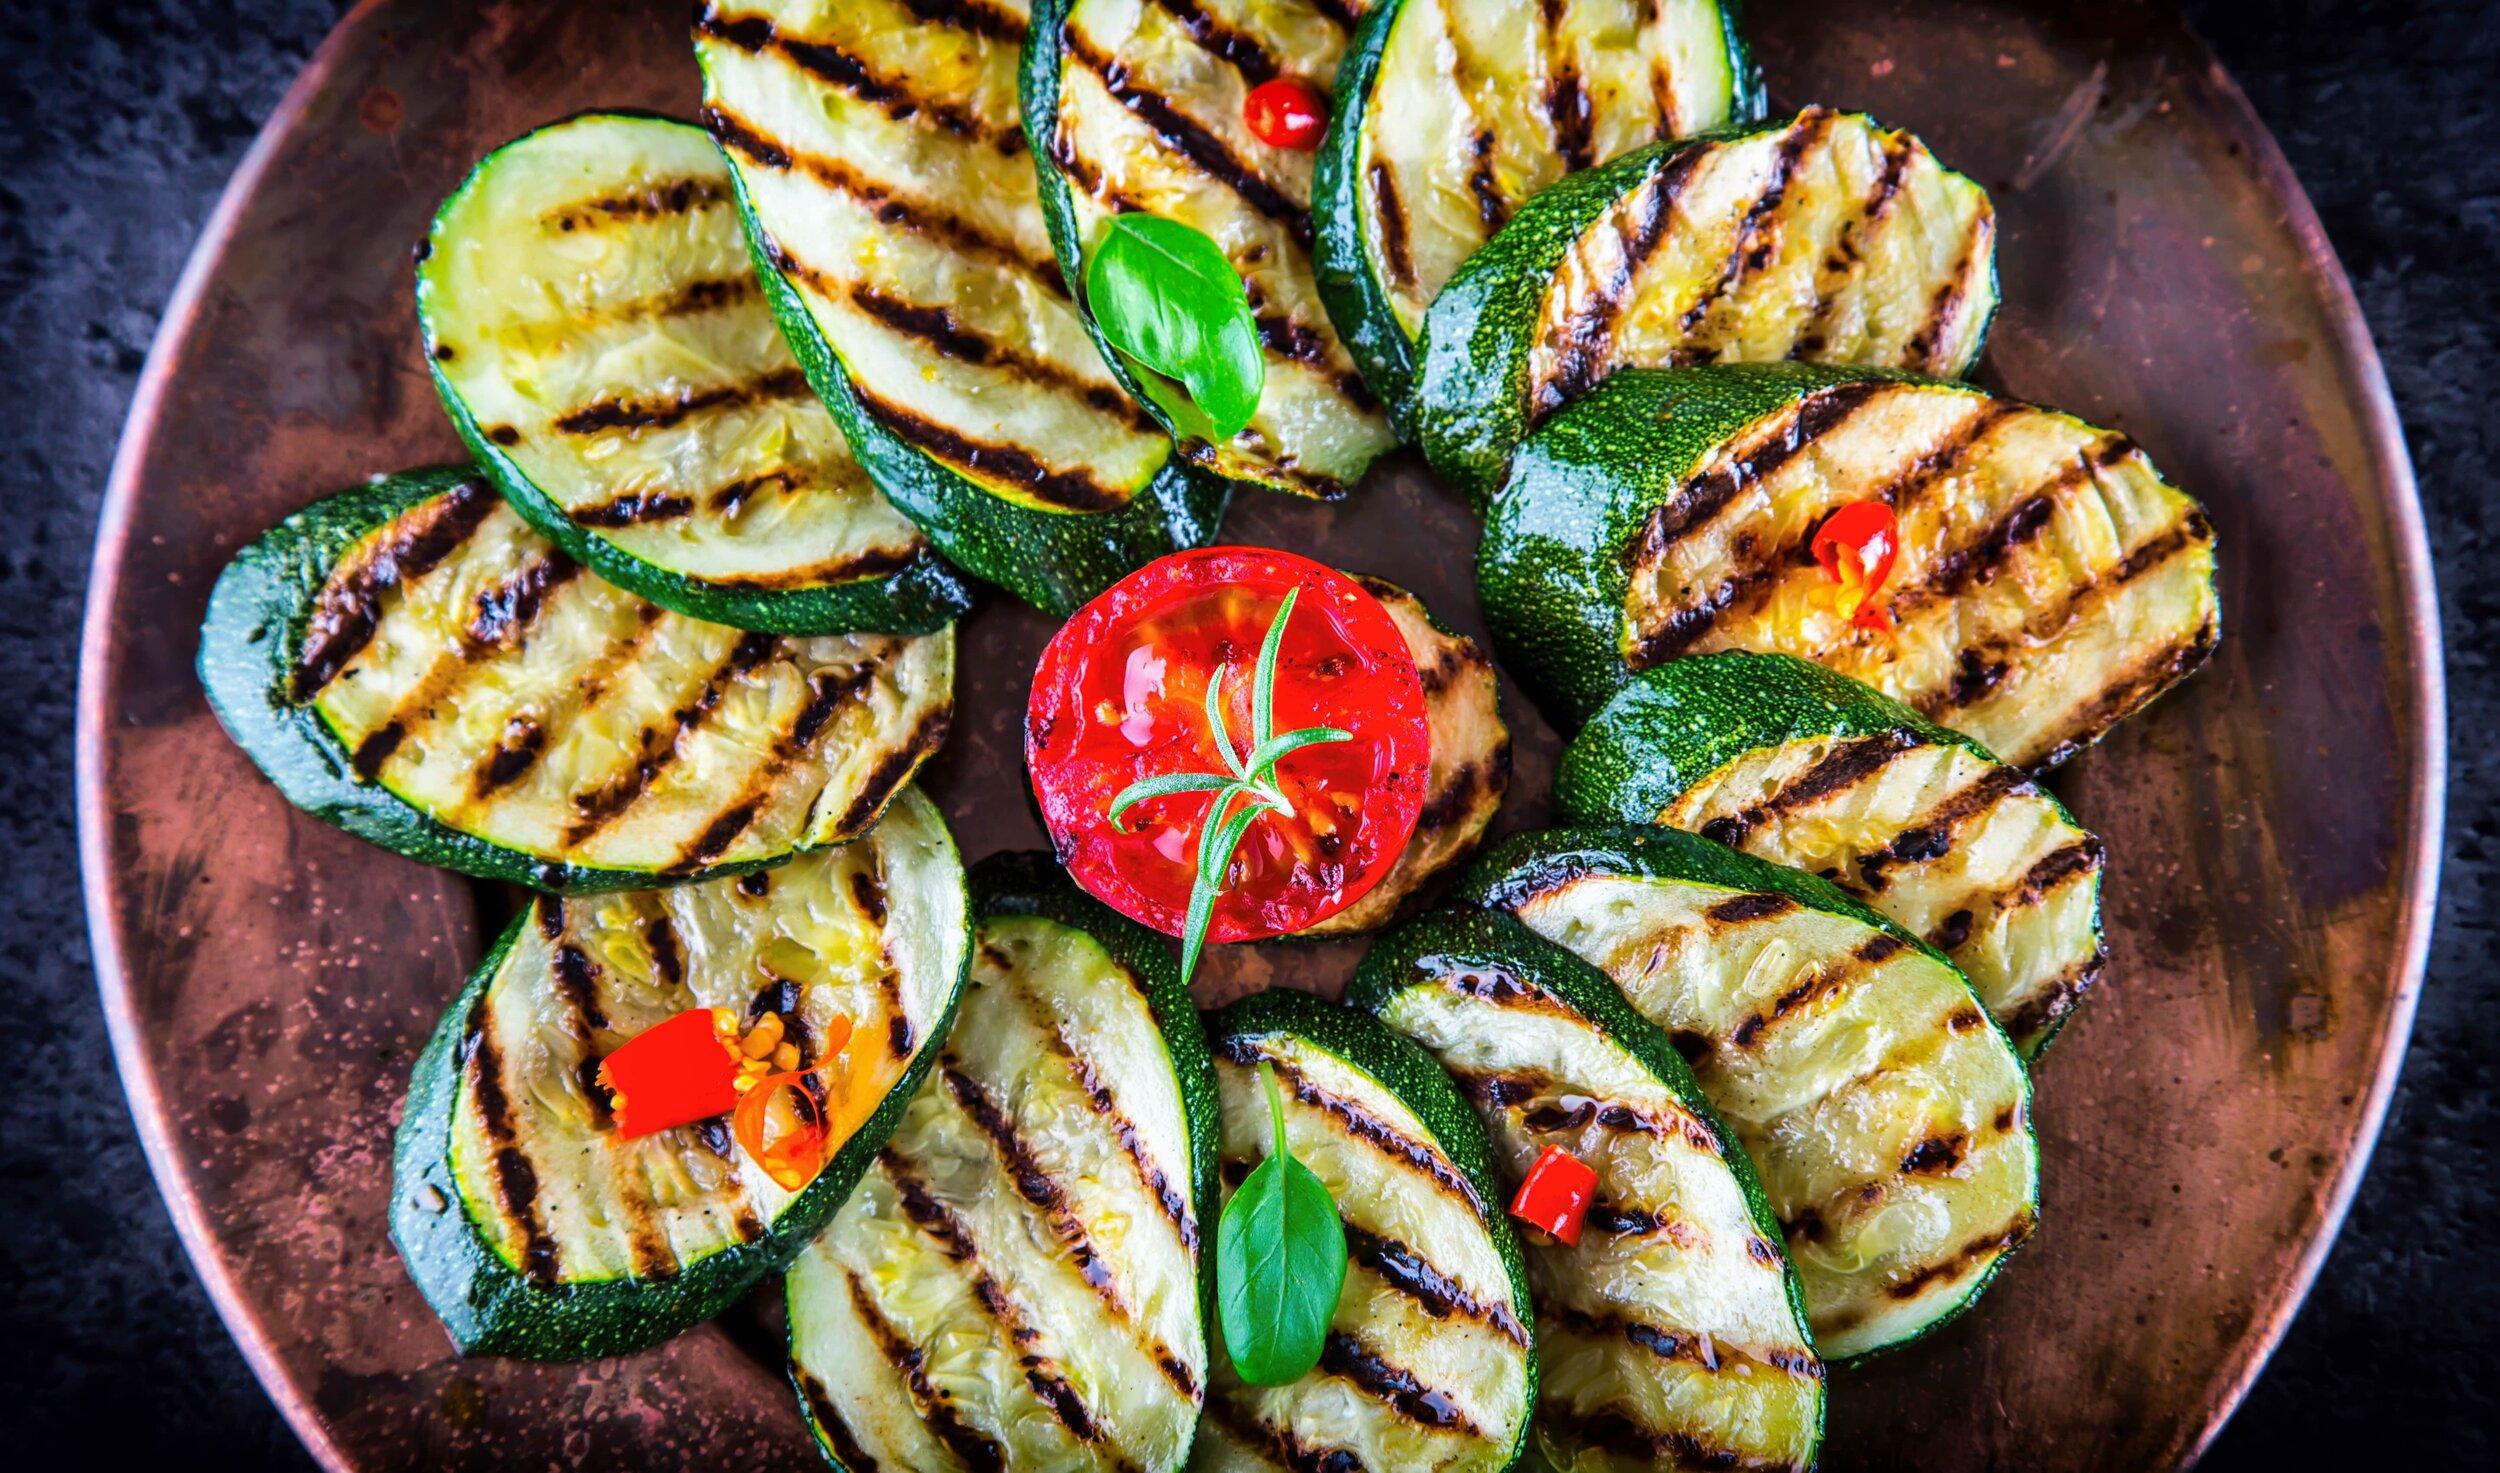 Simple Italian vegan dish of grilled zucchini